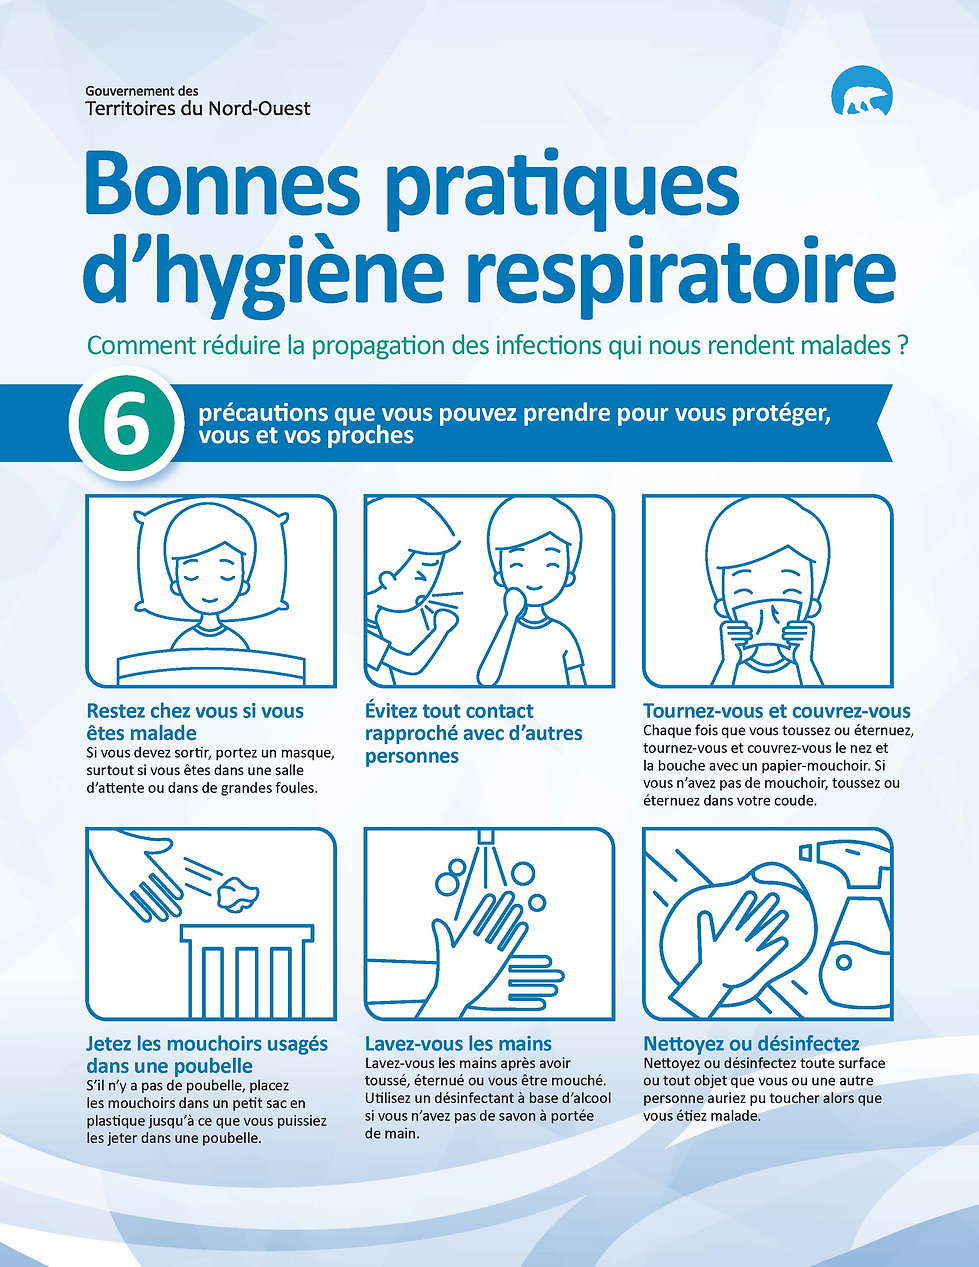 healthy-respiratory-practices-fr.jpg